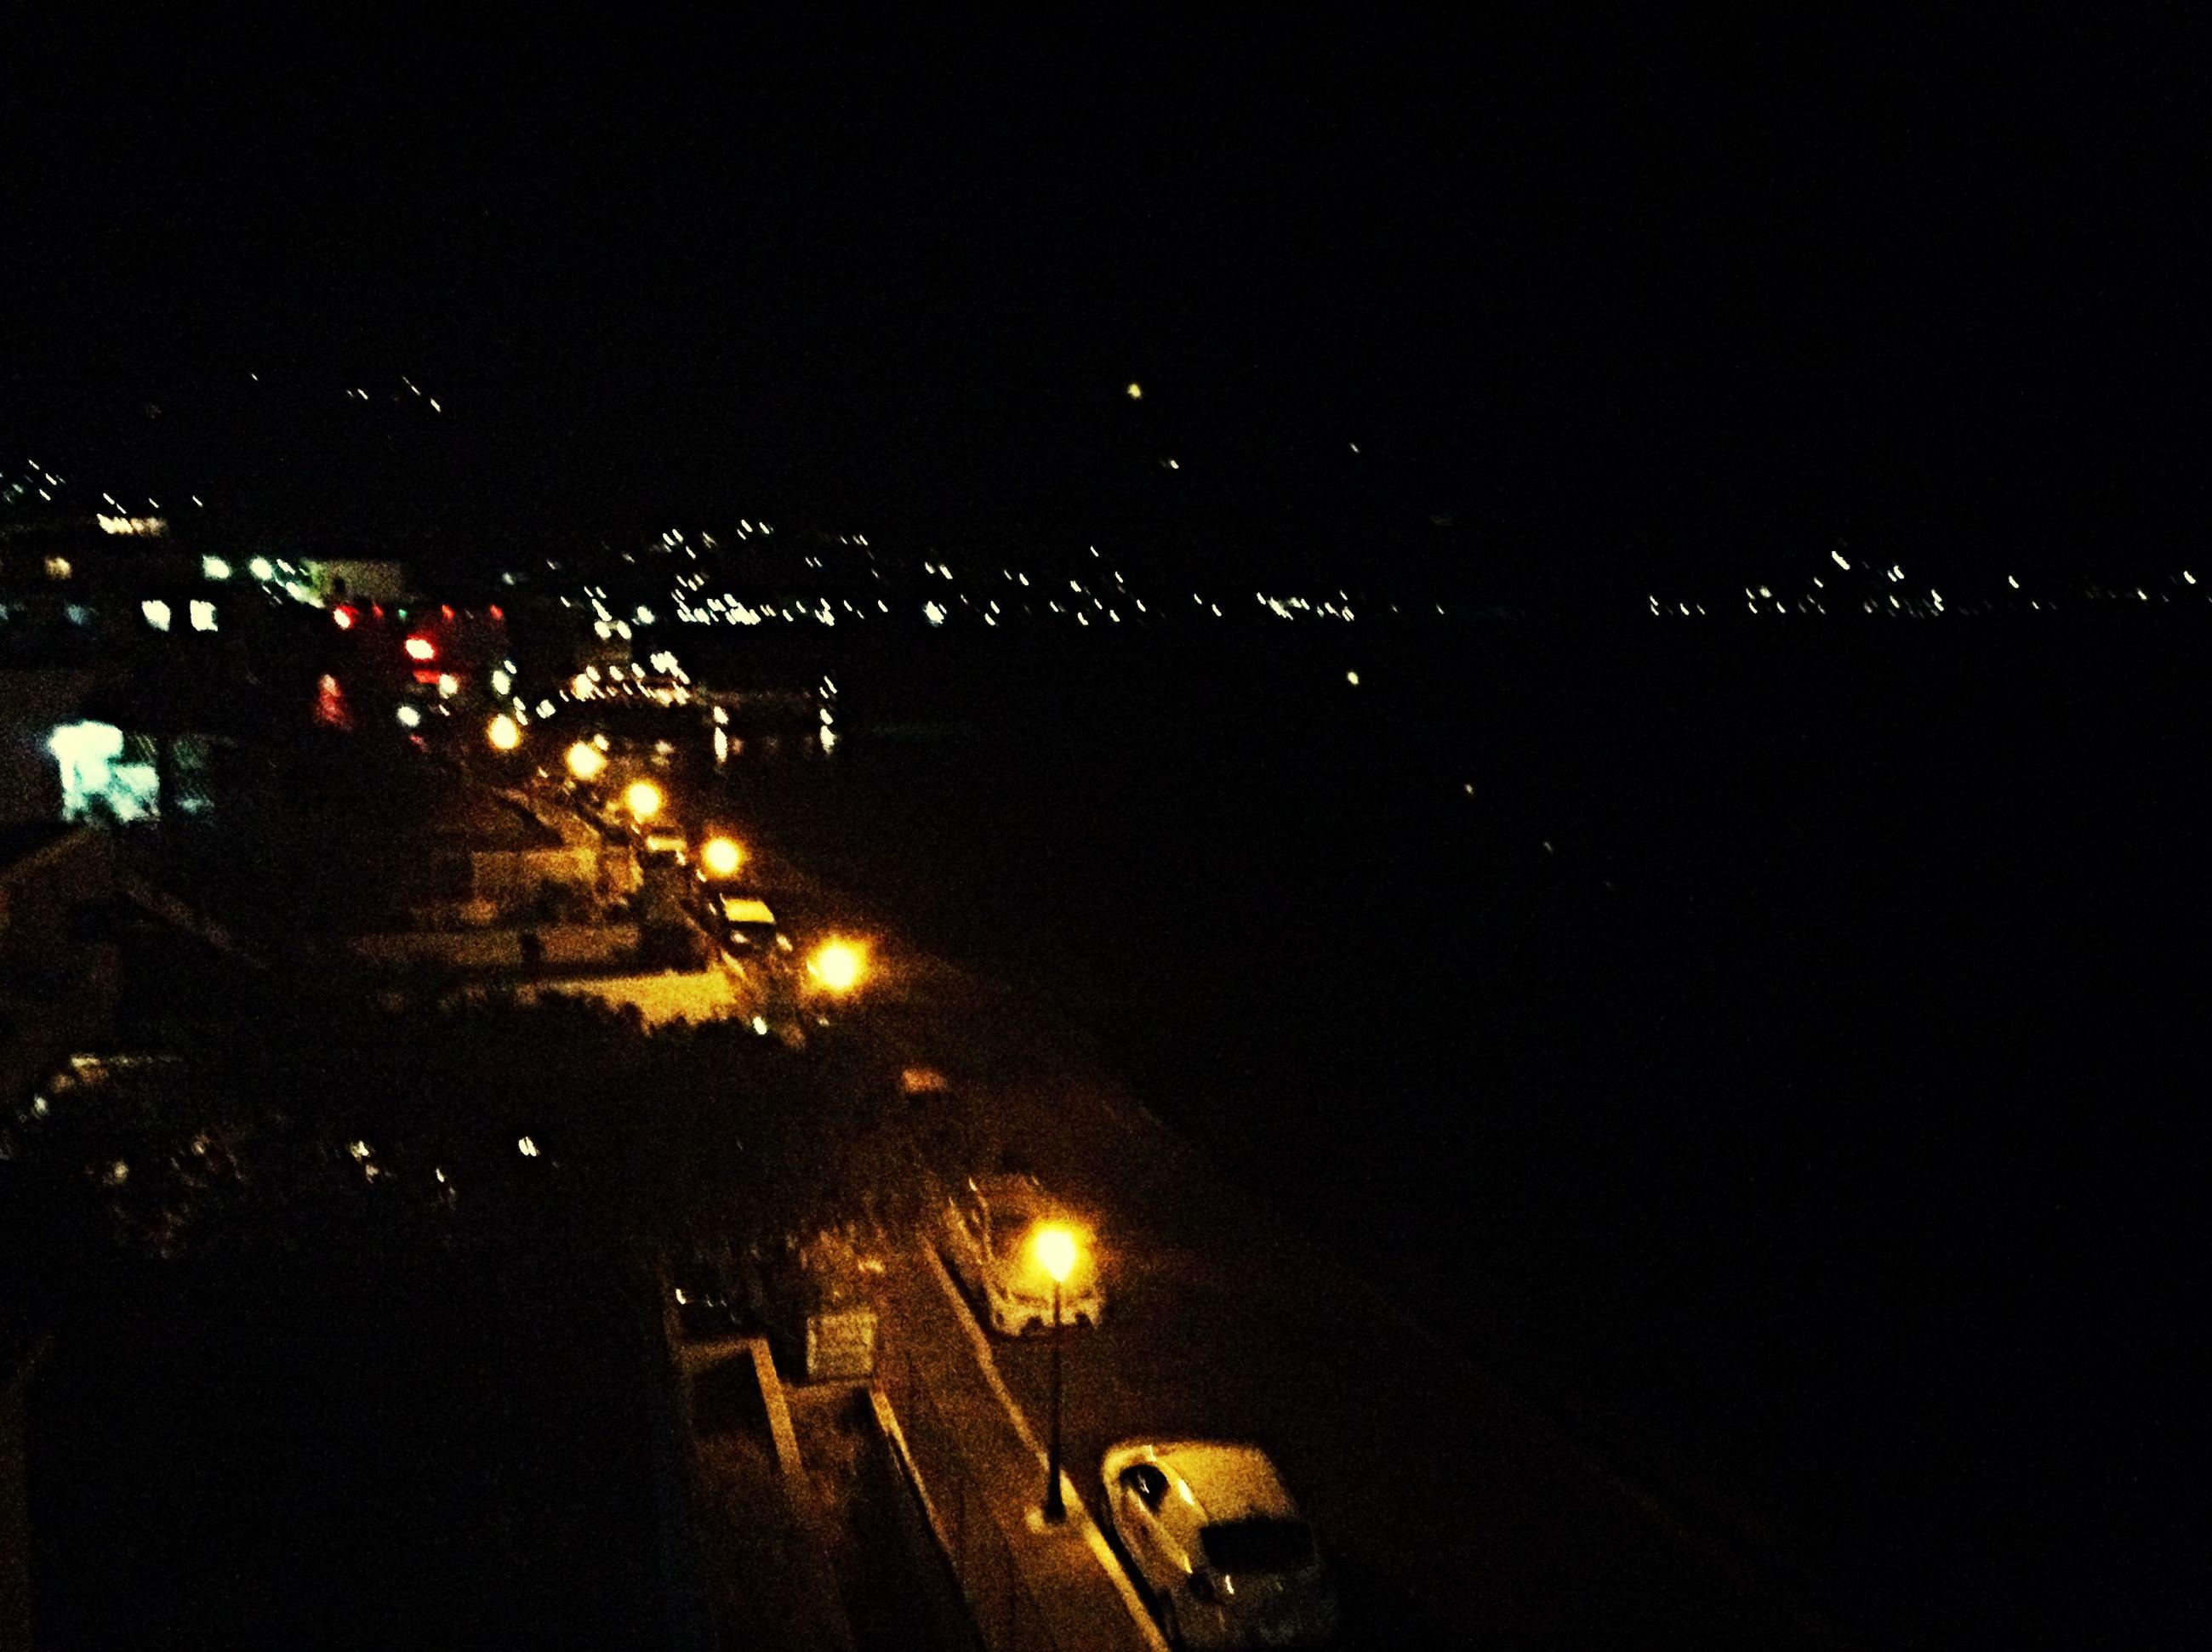 night, illuminated, street light, lighting equipment, city, light - natural phenomenon, dark, street, electricity, low angle view, sky, building exterior, glowing, outdoors, city street, silhouette, transportation, no people, motion, city life